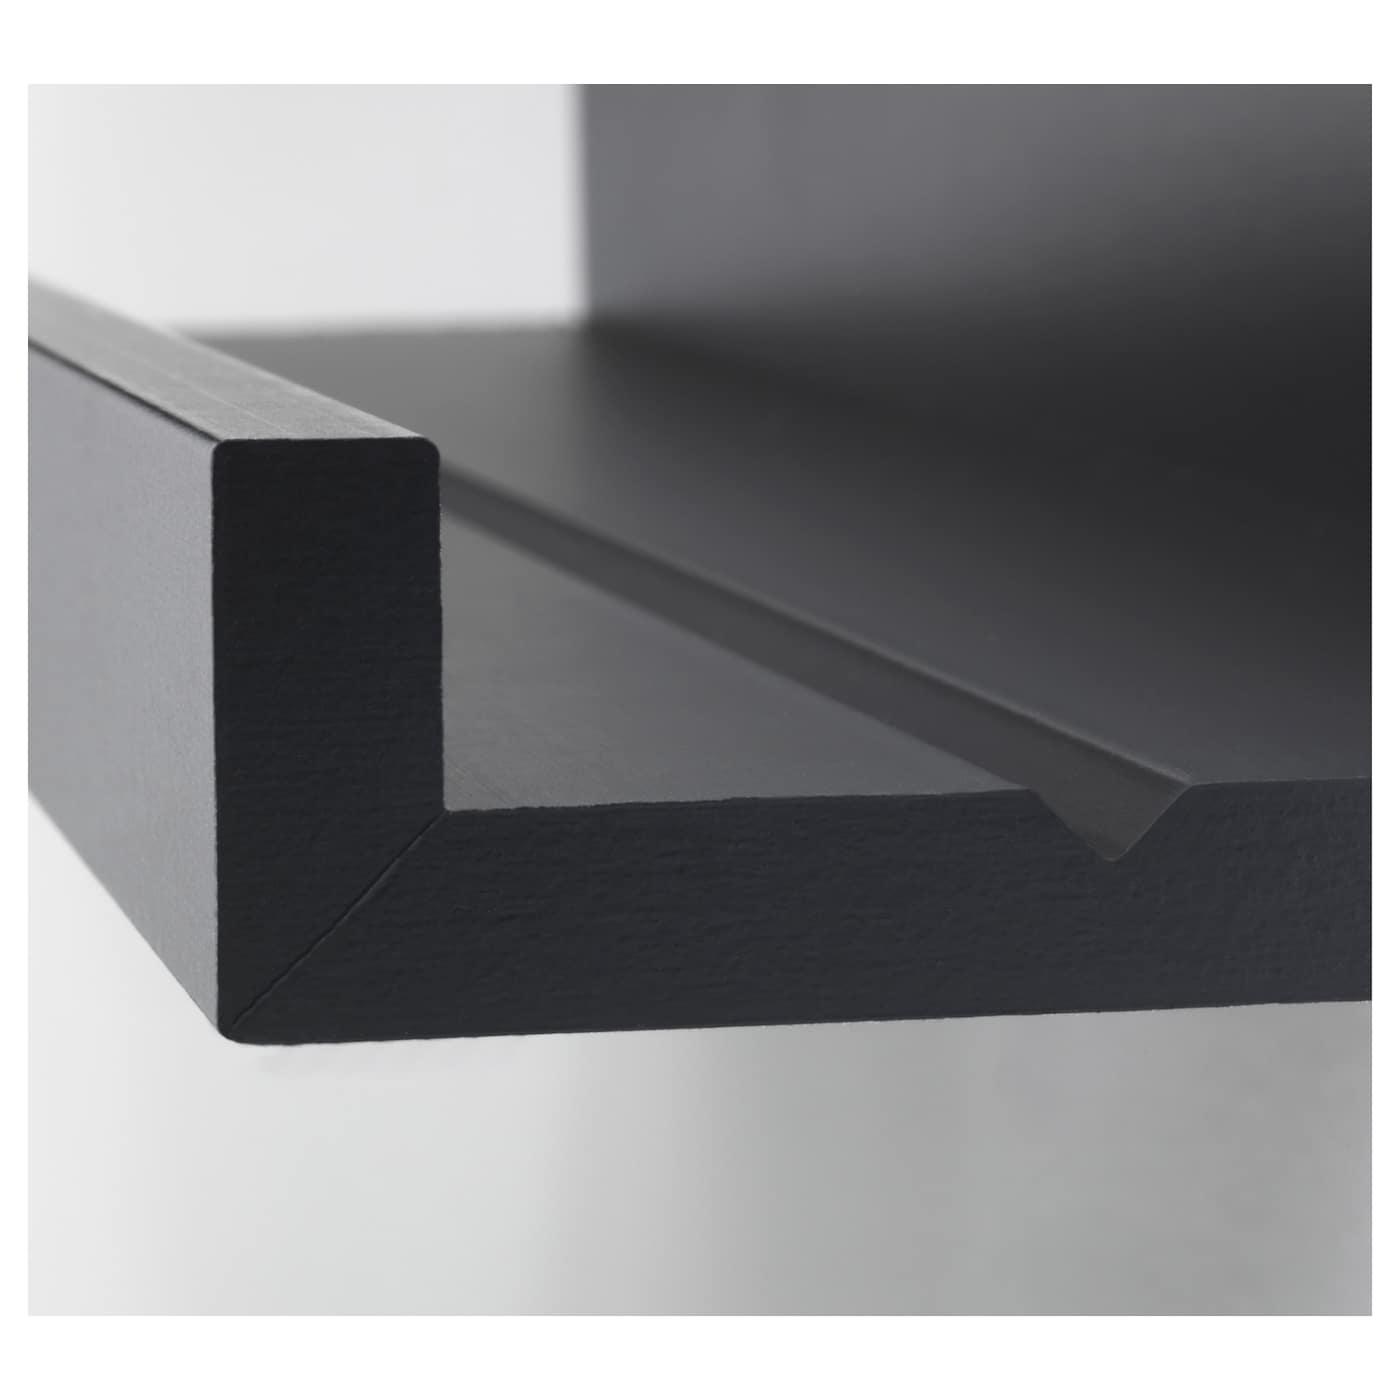 Mosslanda Picture Ledge Black 115 Cm Ikea